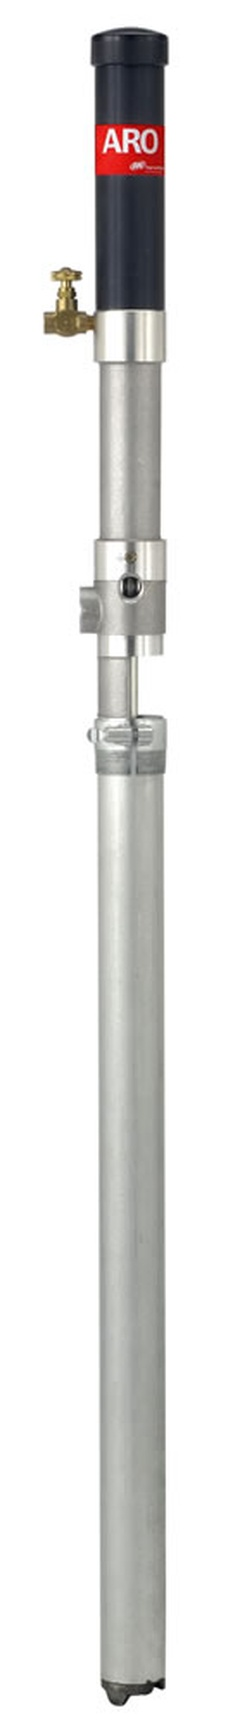 ARO Pump 612041-3 Ingersoll Rand